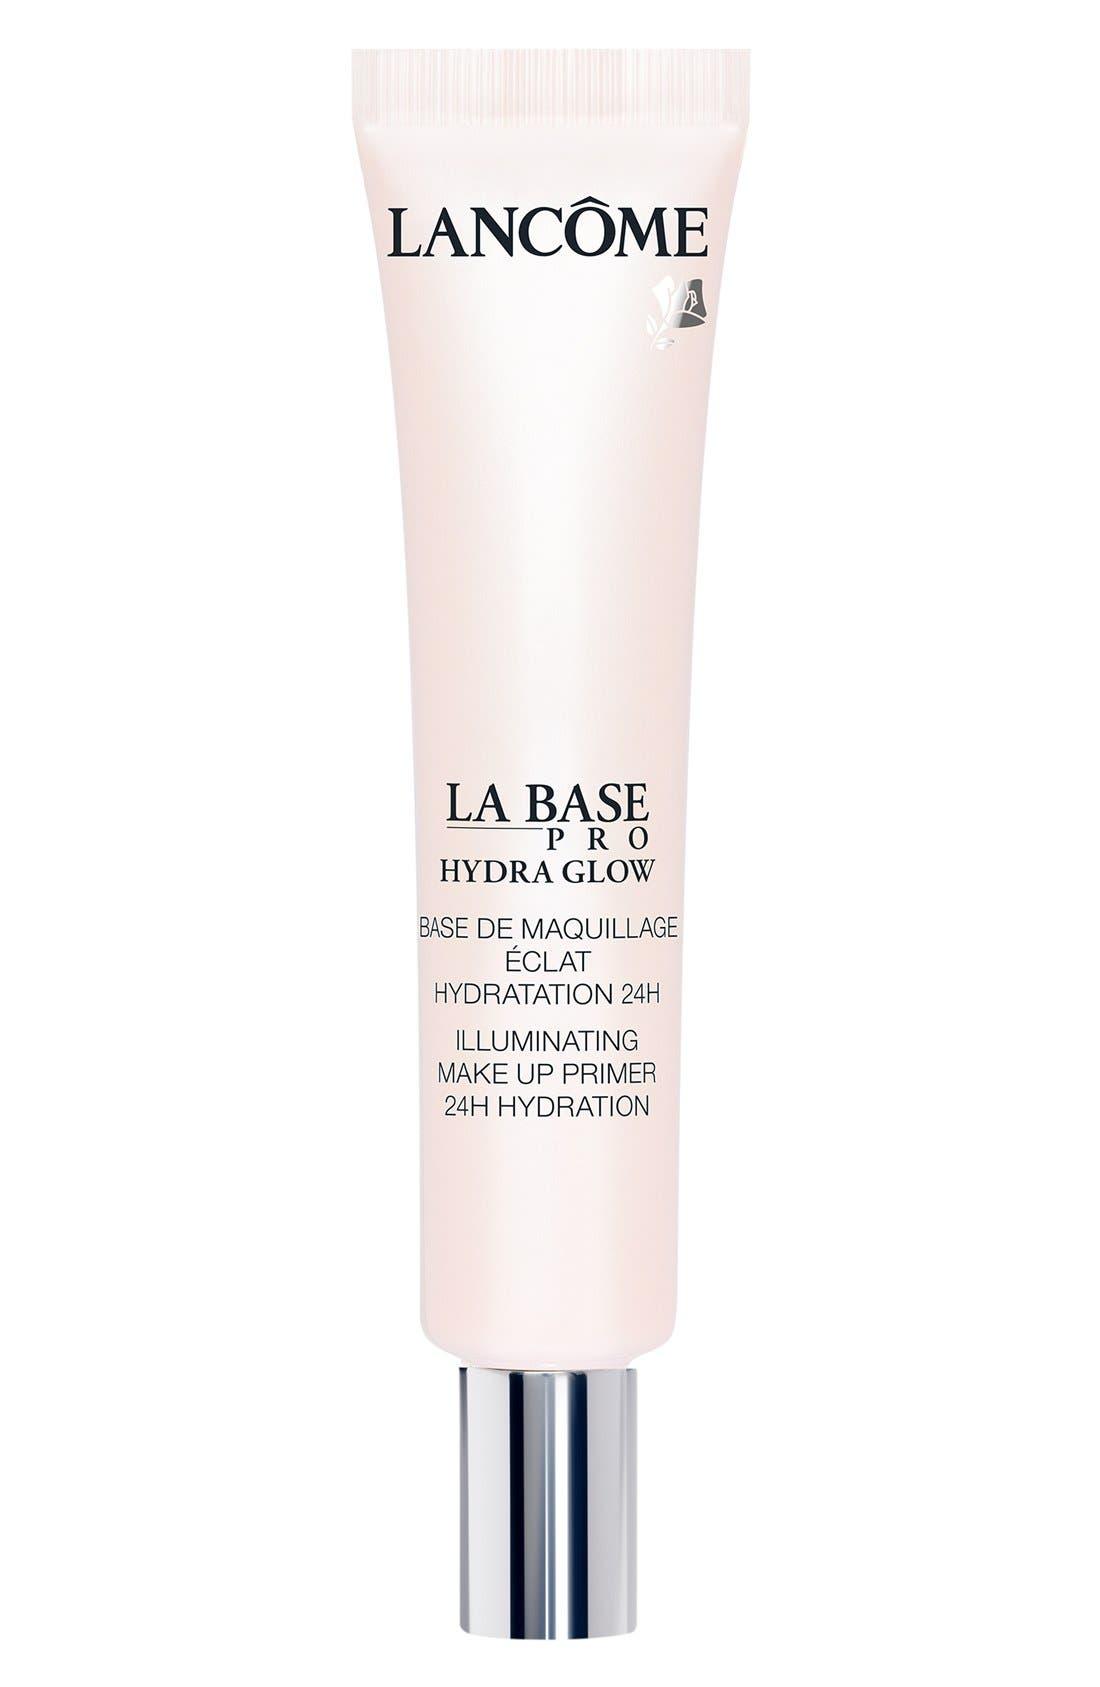 Lancôme La Base Pro - Hydra Glow Illuminating Makeup Primer 24-Hour Hydration